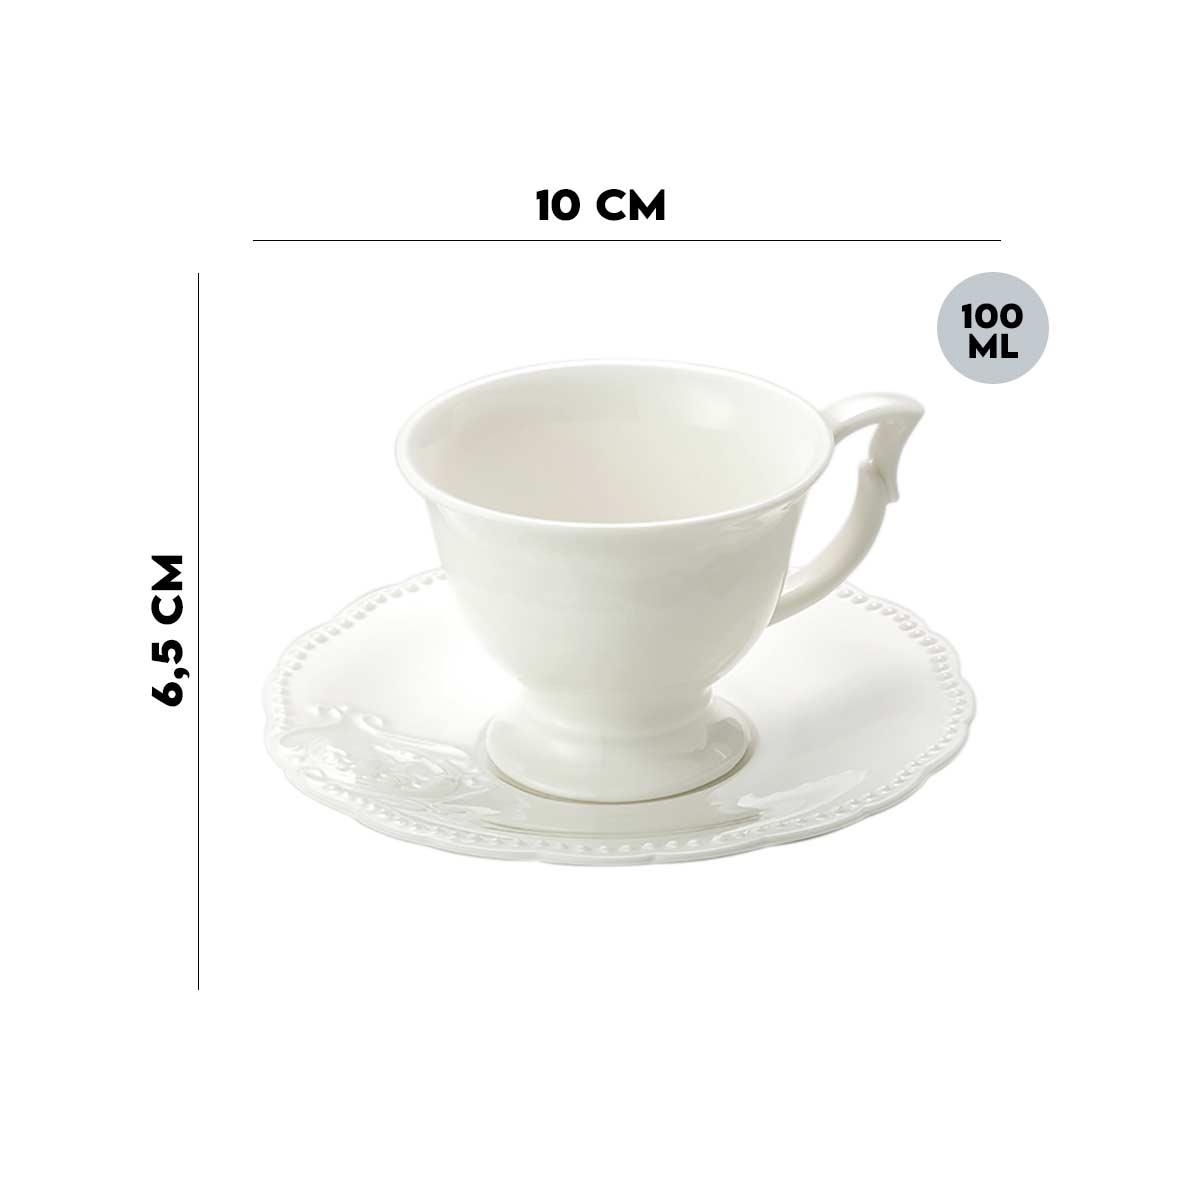 Jogo 6 Xícaras p/Café c/Pires de Porcelana Branco 100ml Lyor  - Lemis